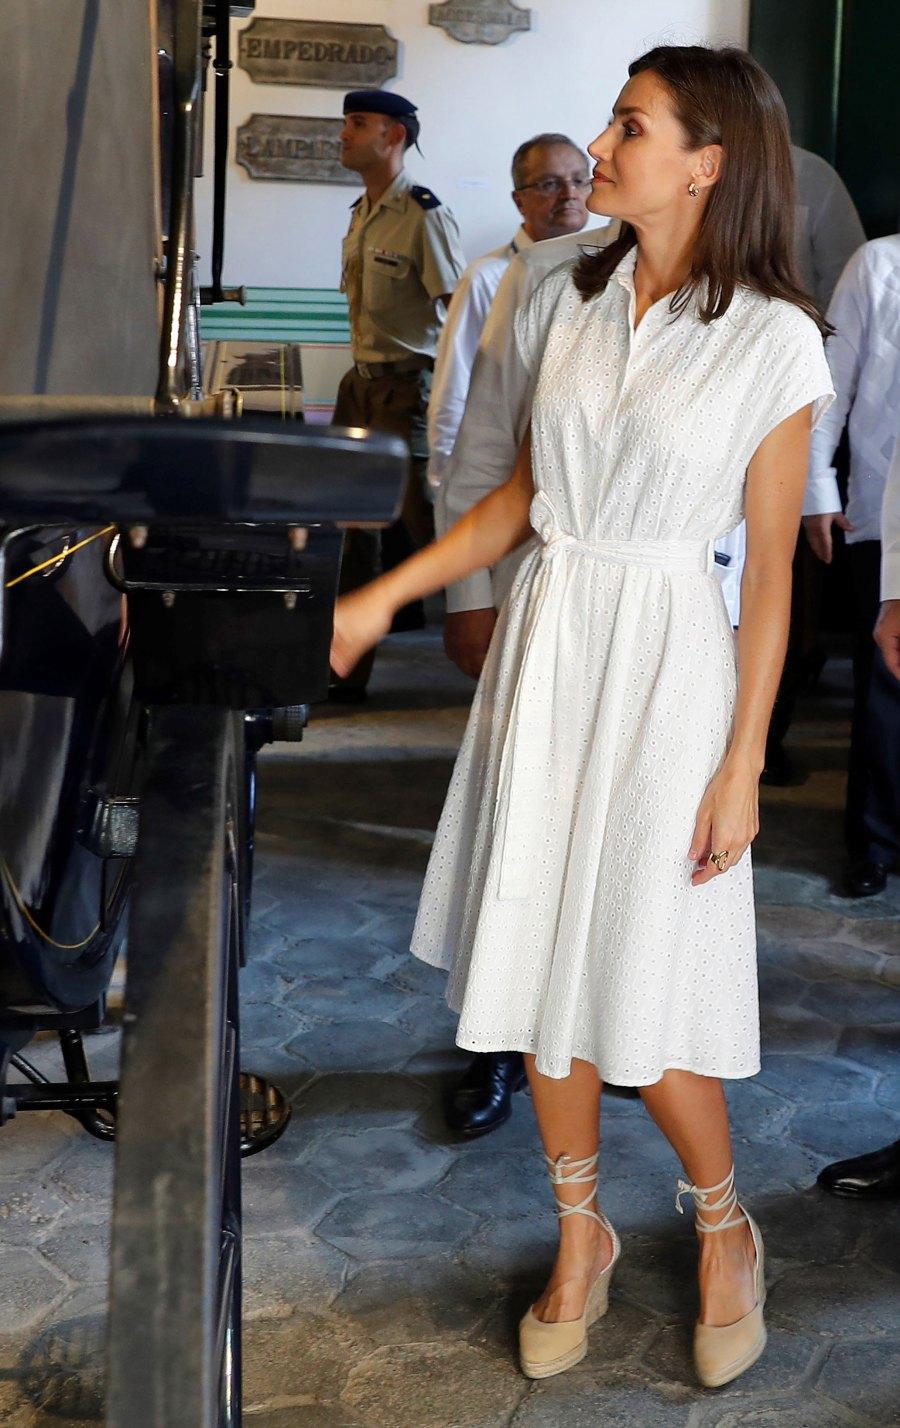 Queen Letizia White Dress November 13, 2019